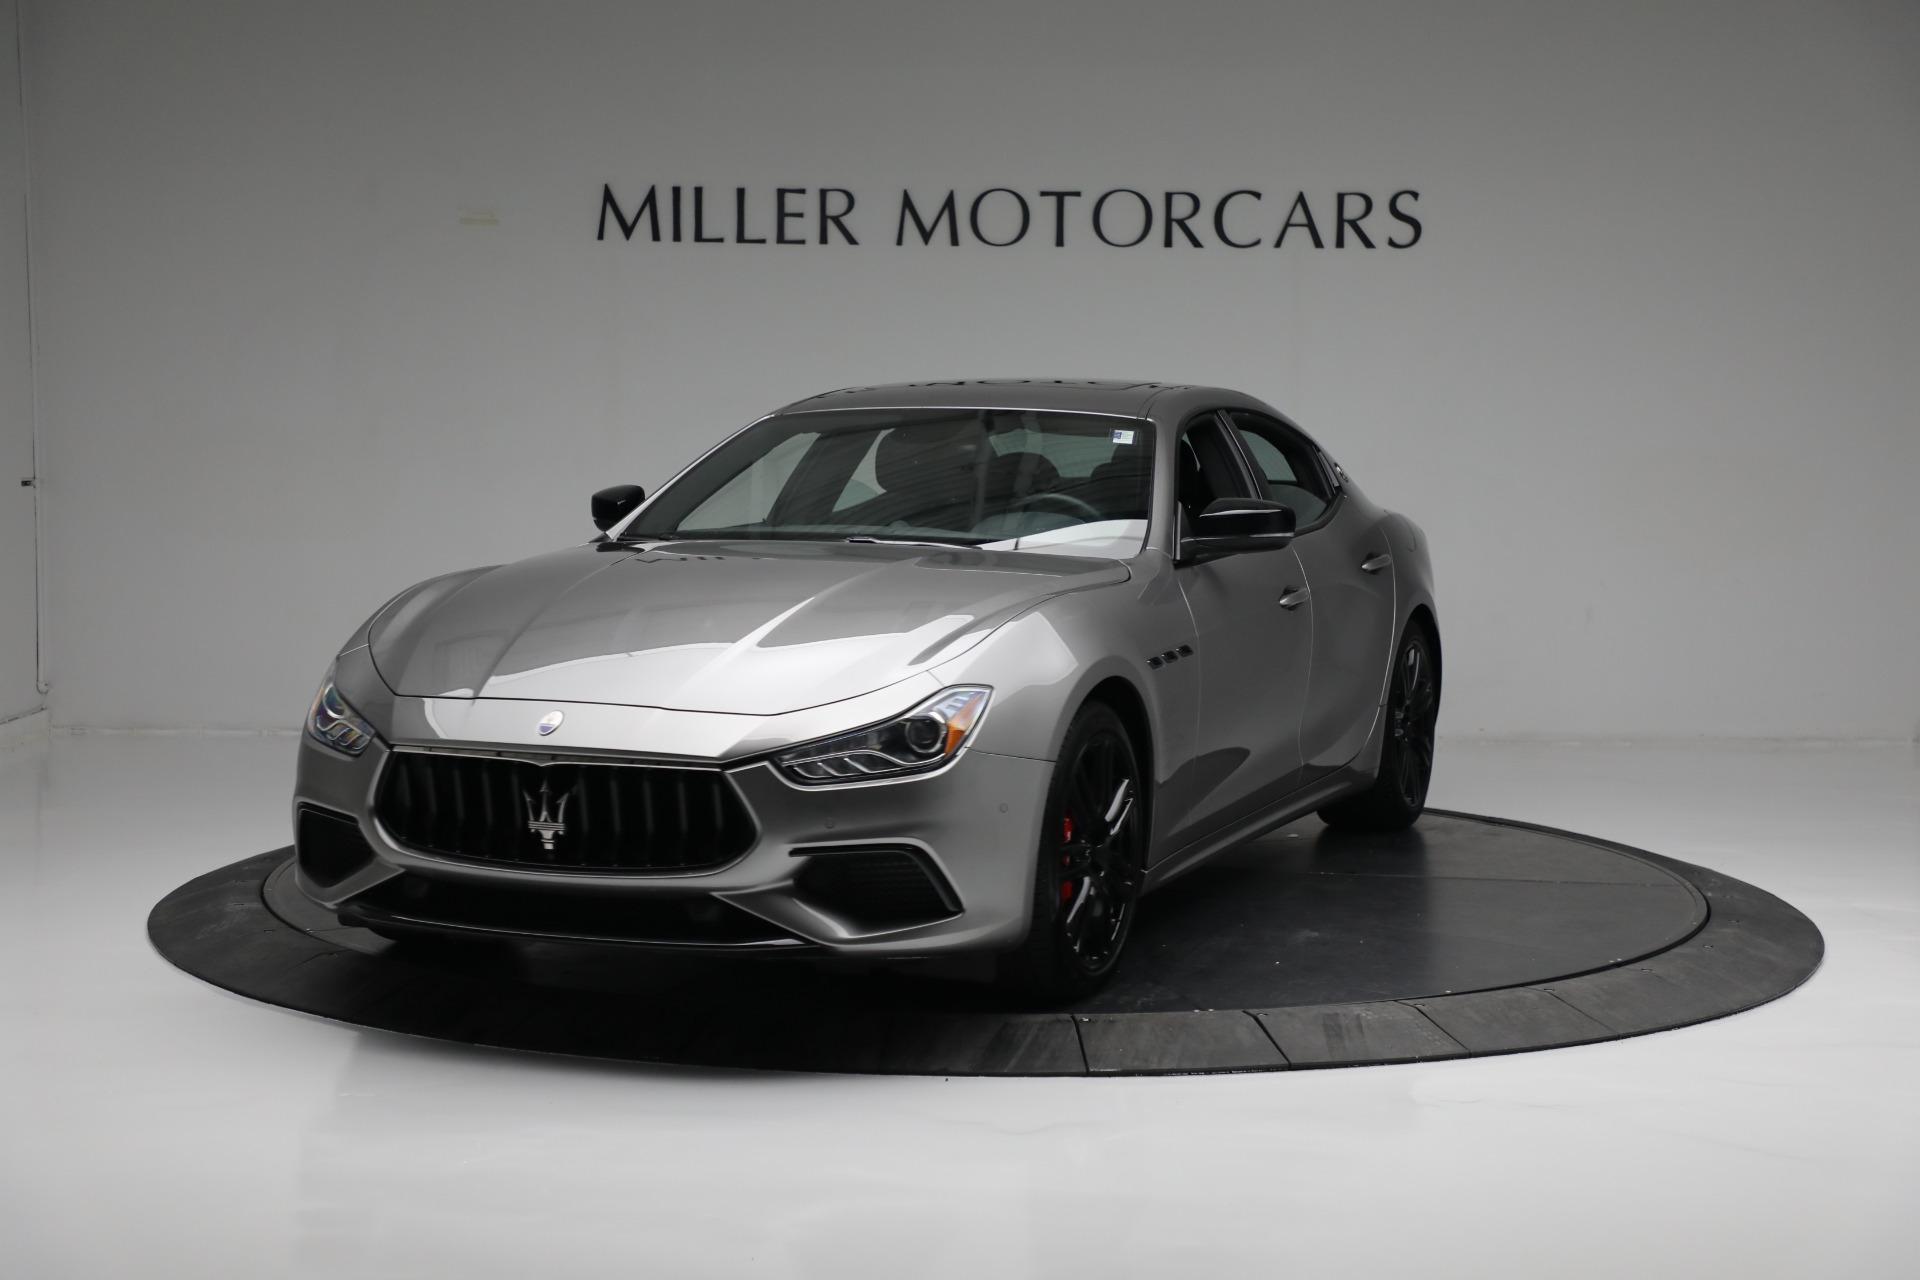 New 2021 Maserati Ghibli S Q4 for sale $90,075 at Maserati of Greenwich in Greenwich CT 06830 1